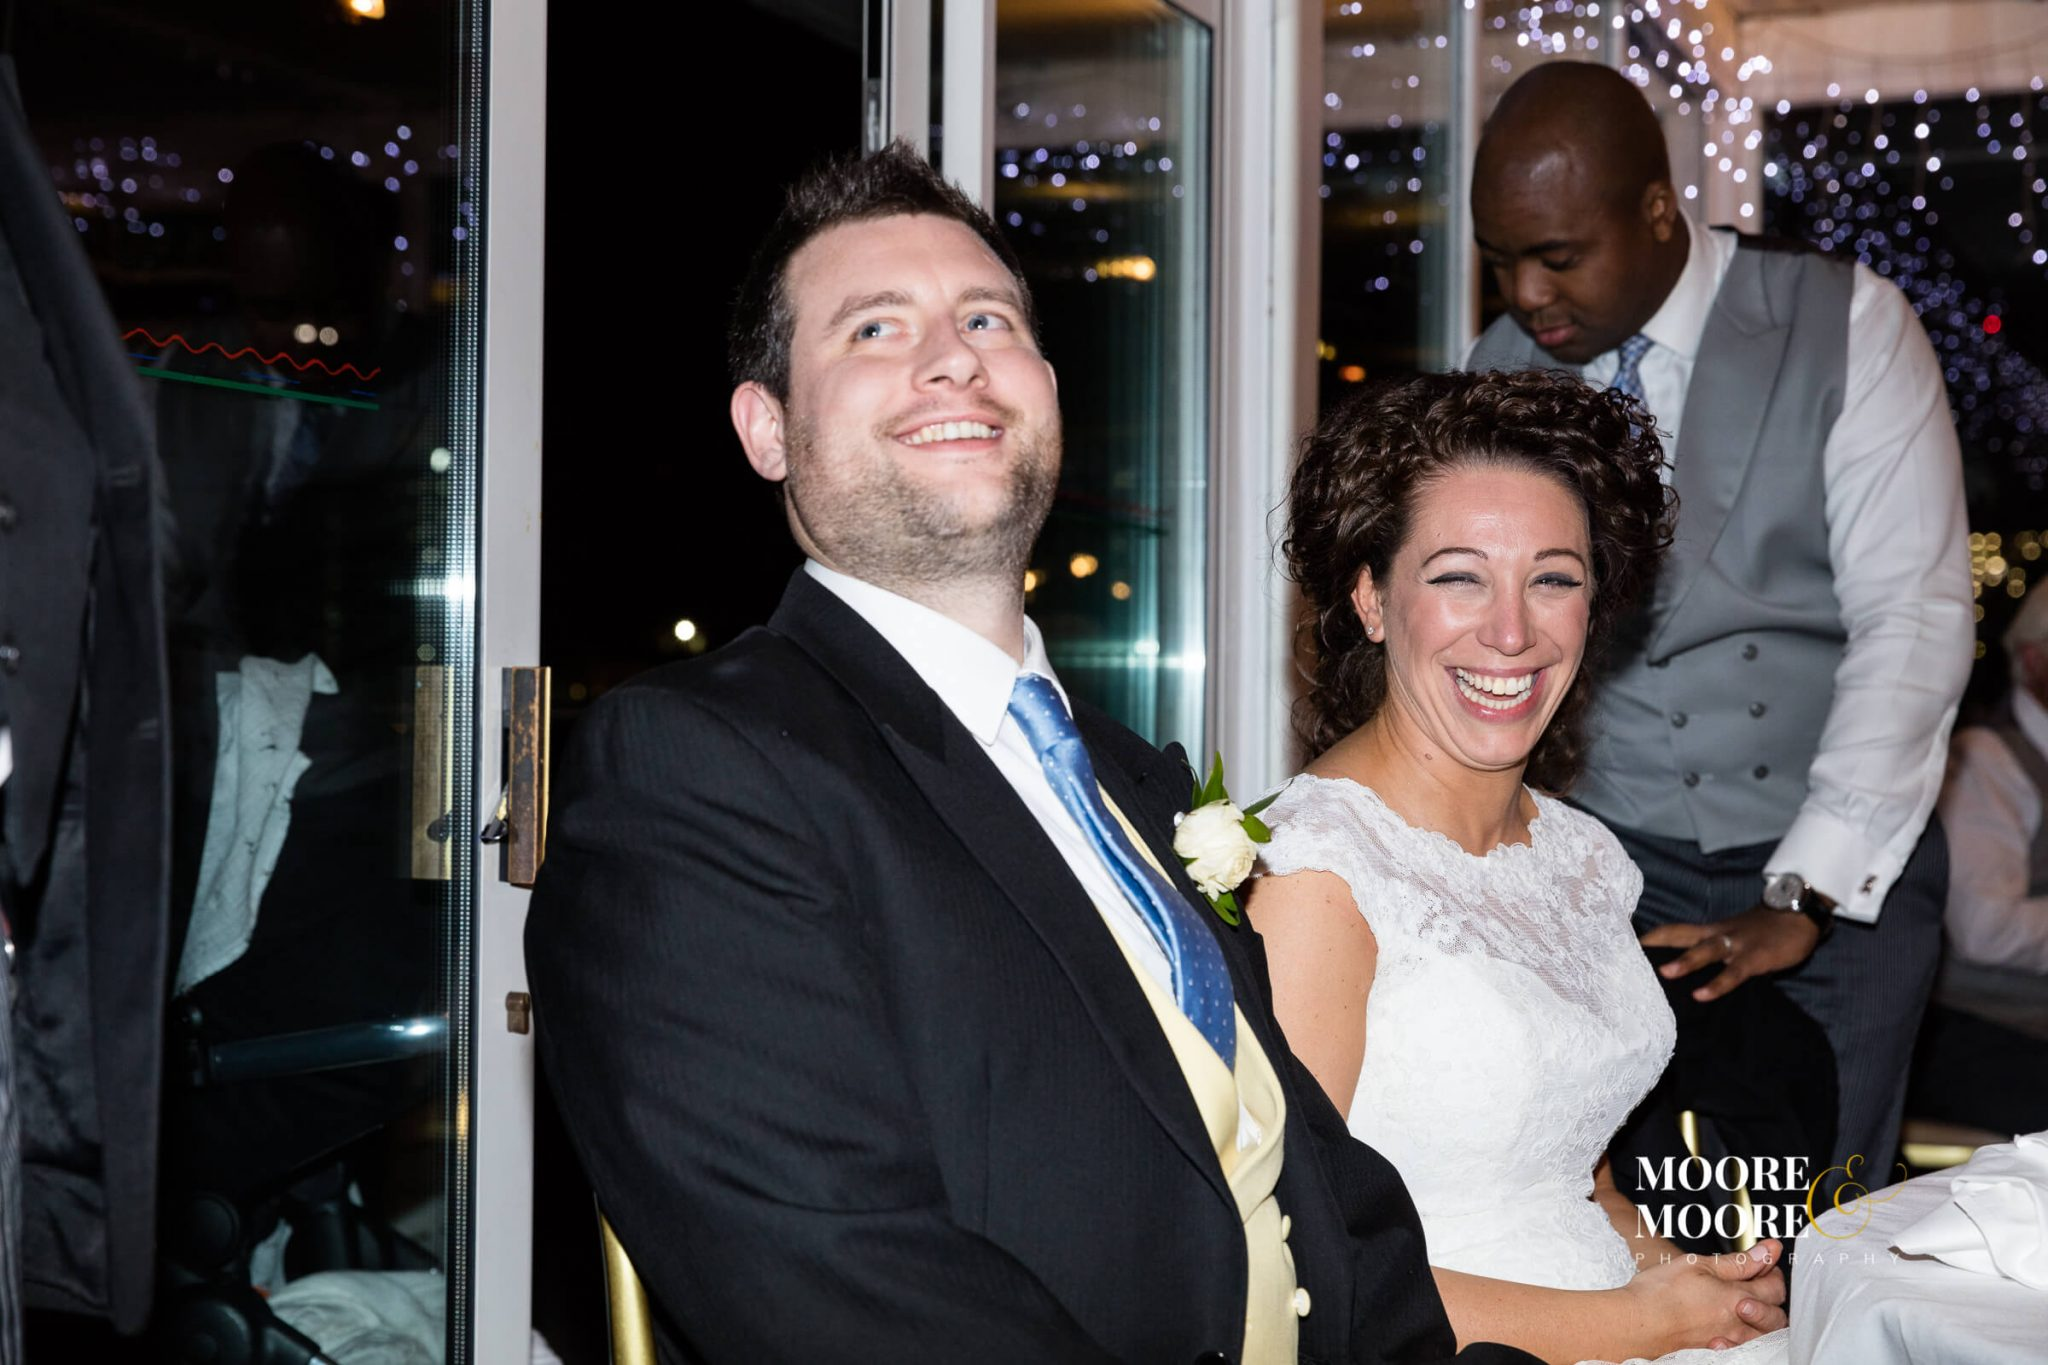 Bride and Groom big smiles, wedding photos by Hampshire Wedding Photographer, Helen Moore of Moore&Moore Photography